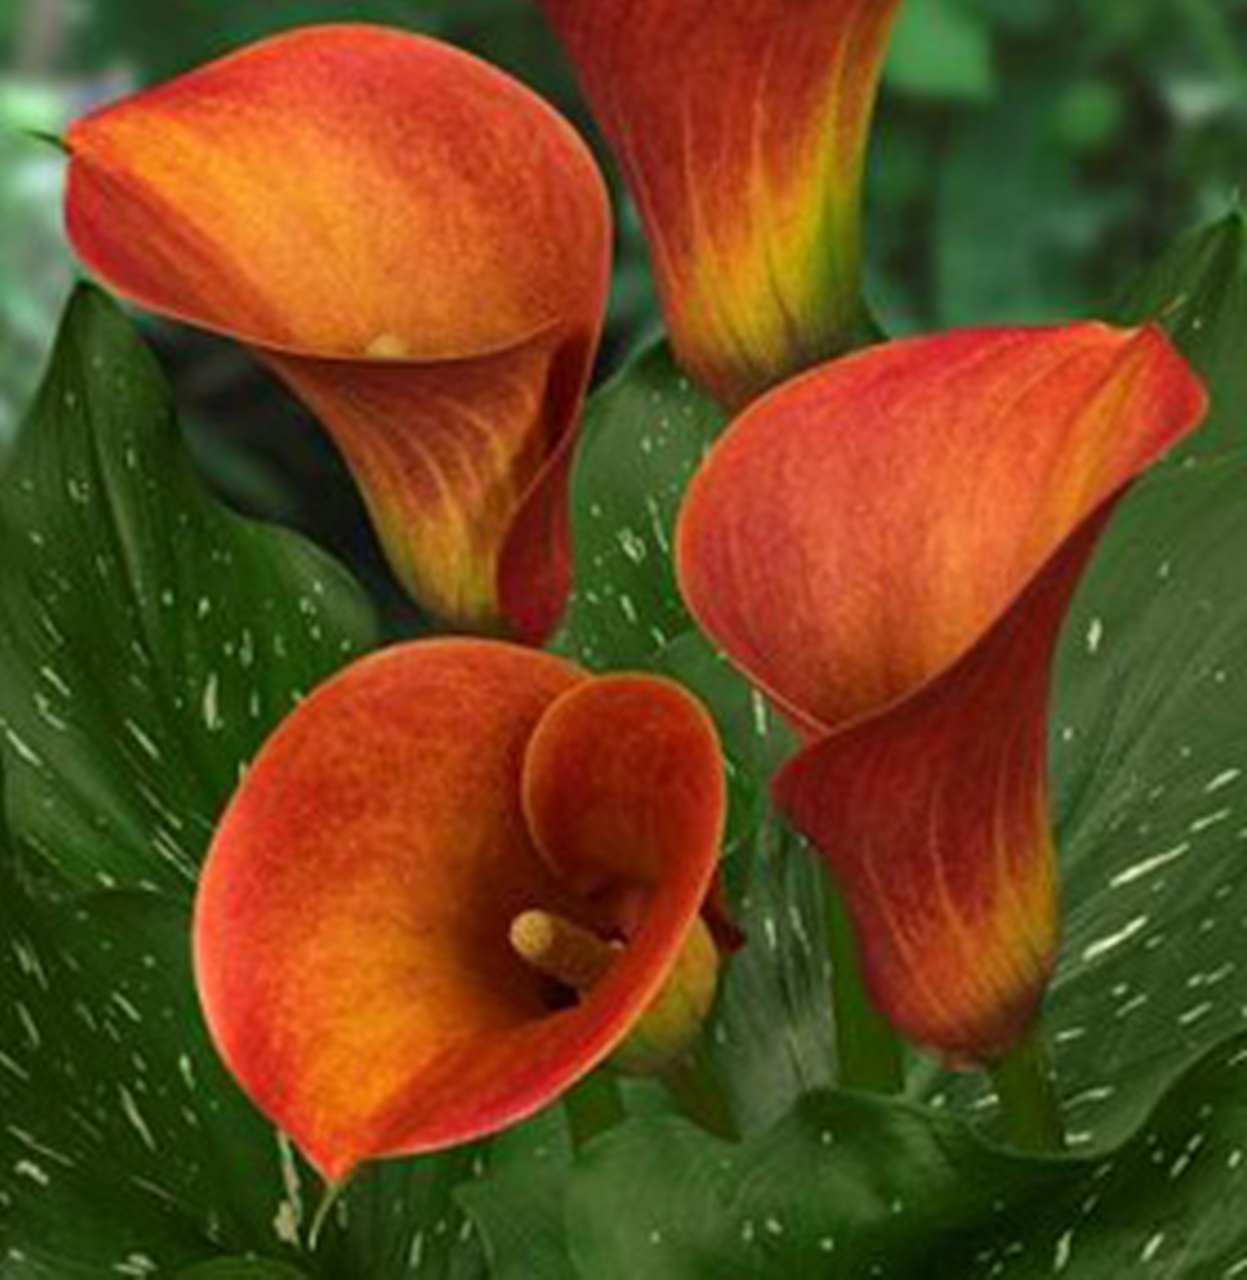 Beautiful Flowers | The Real Myfarm